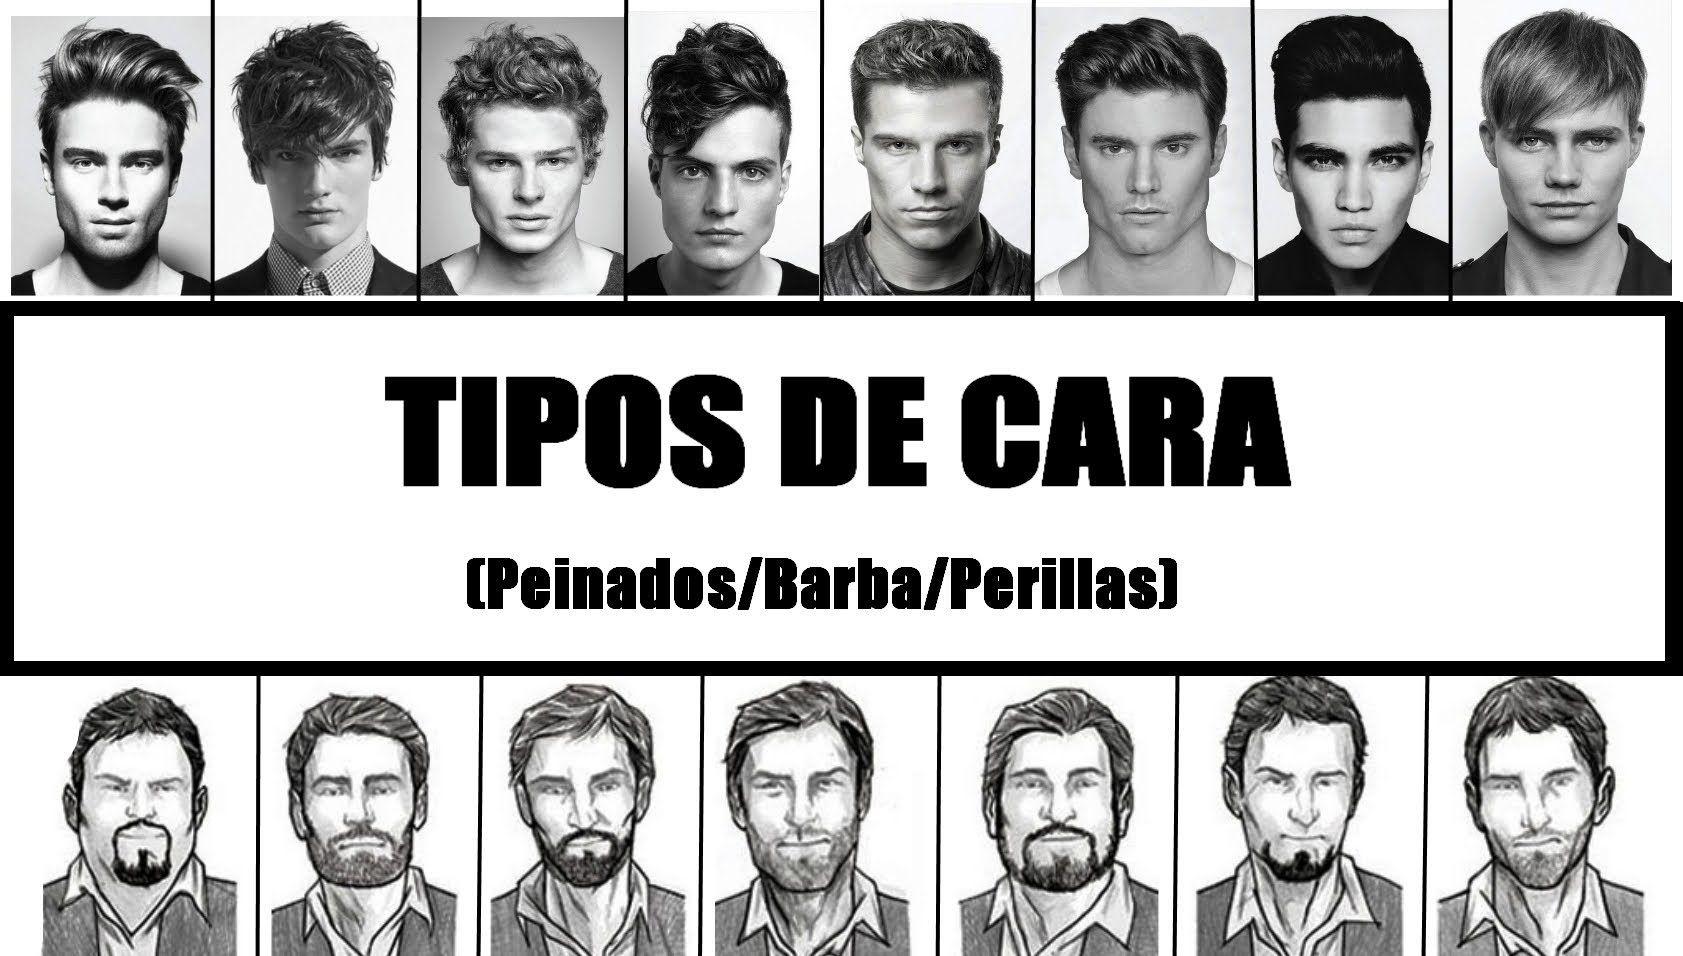 Tipos De Cara Tipos De Cara Hombre Tipos De Cara Peinados De Hombre